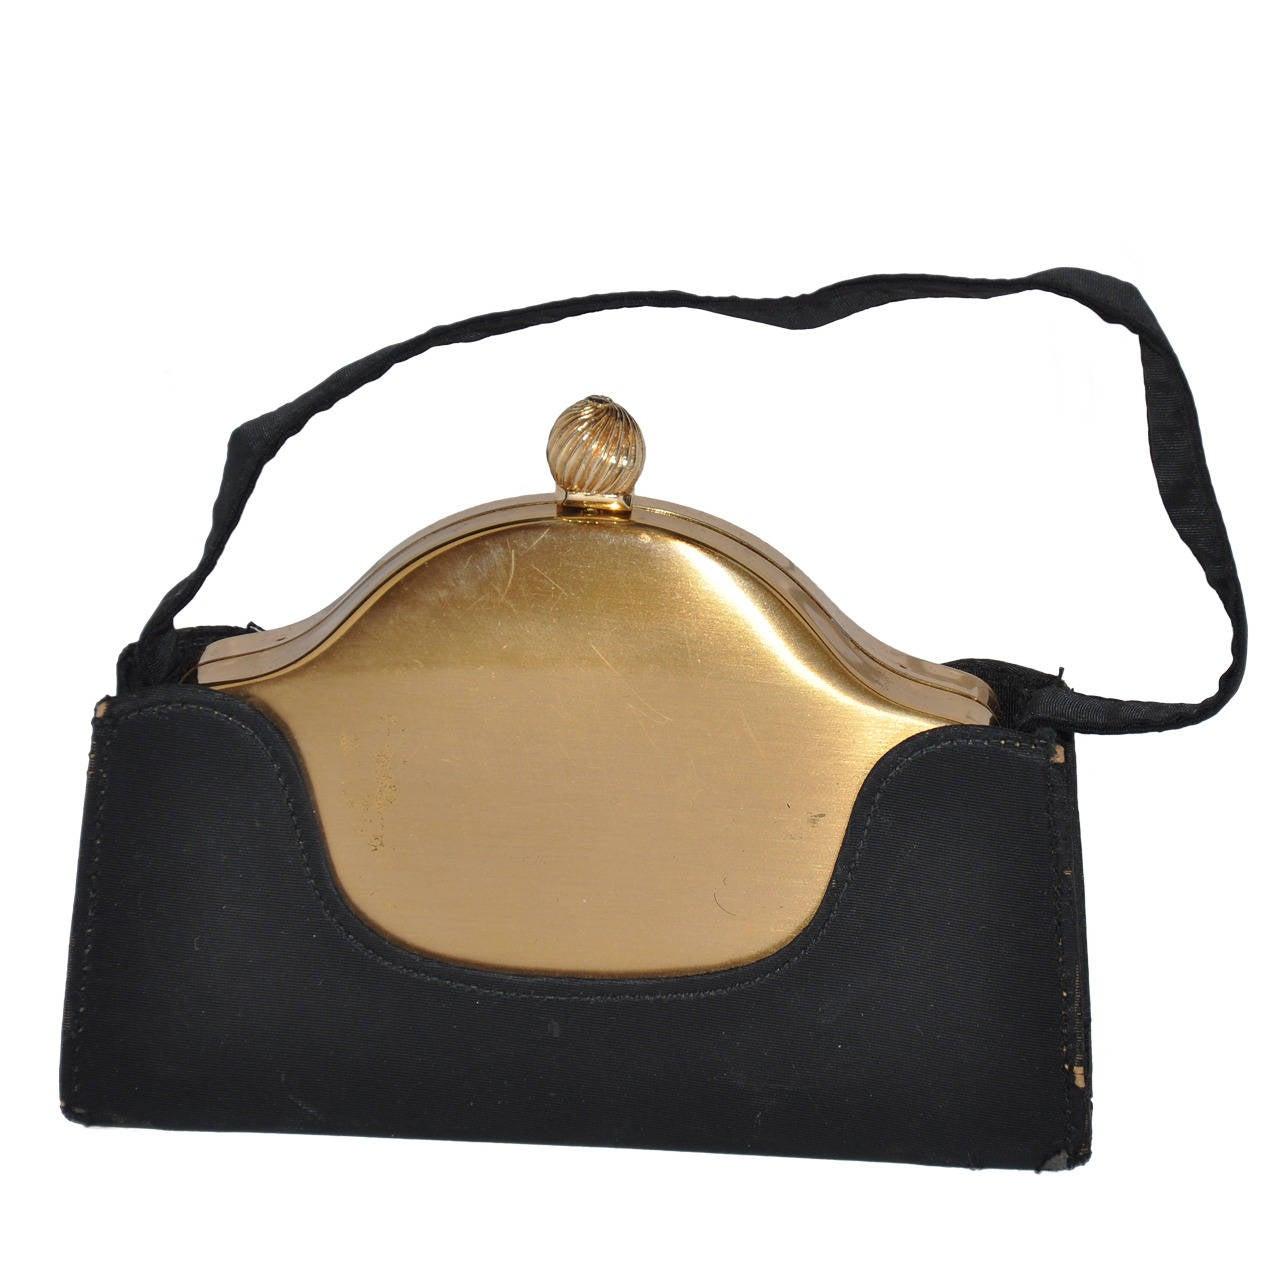 VoLupte Gold Hardware Make-Up Clutch with Cover Black Handbag Cover For Sale